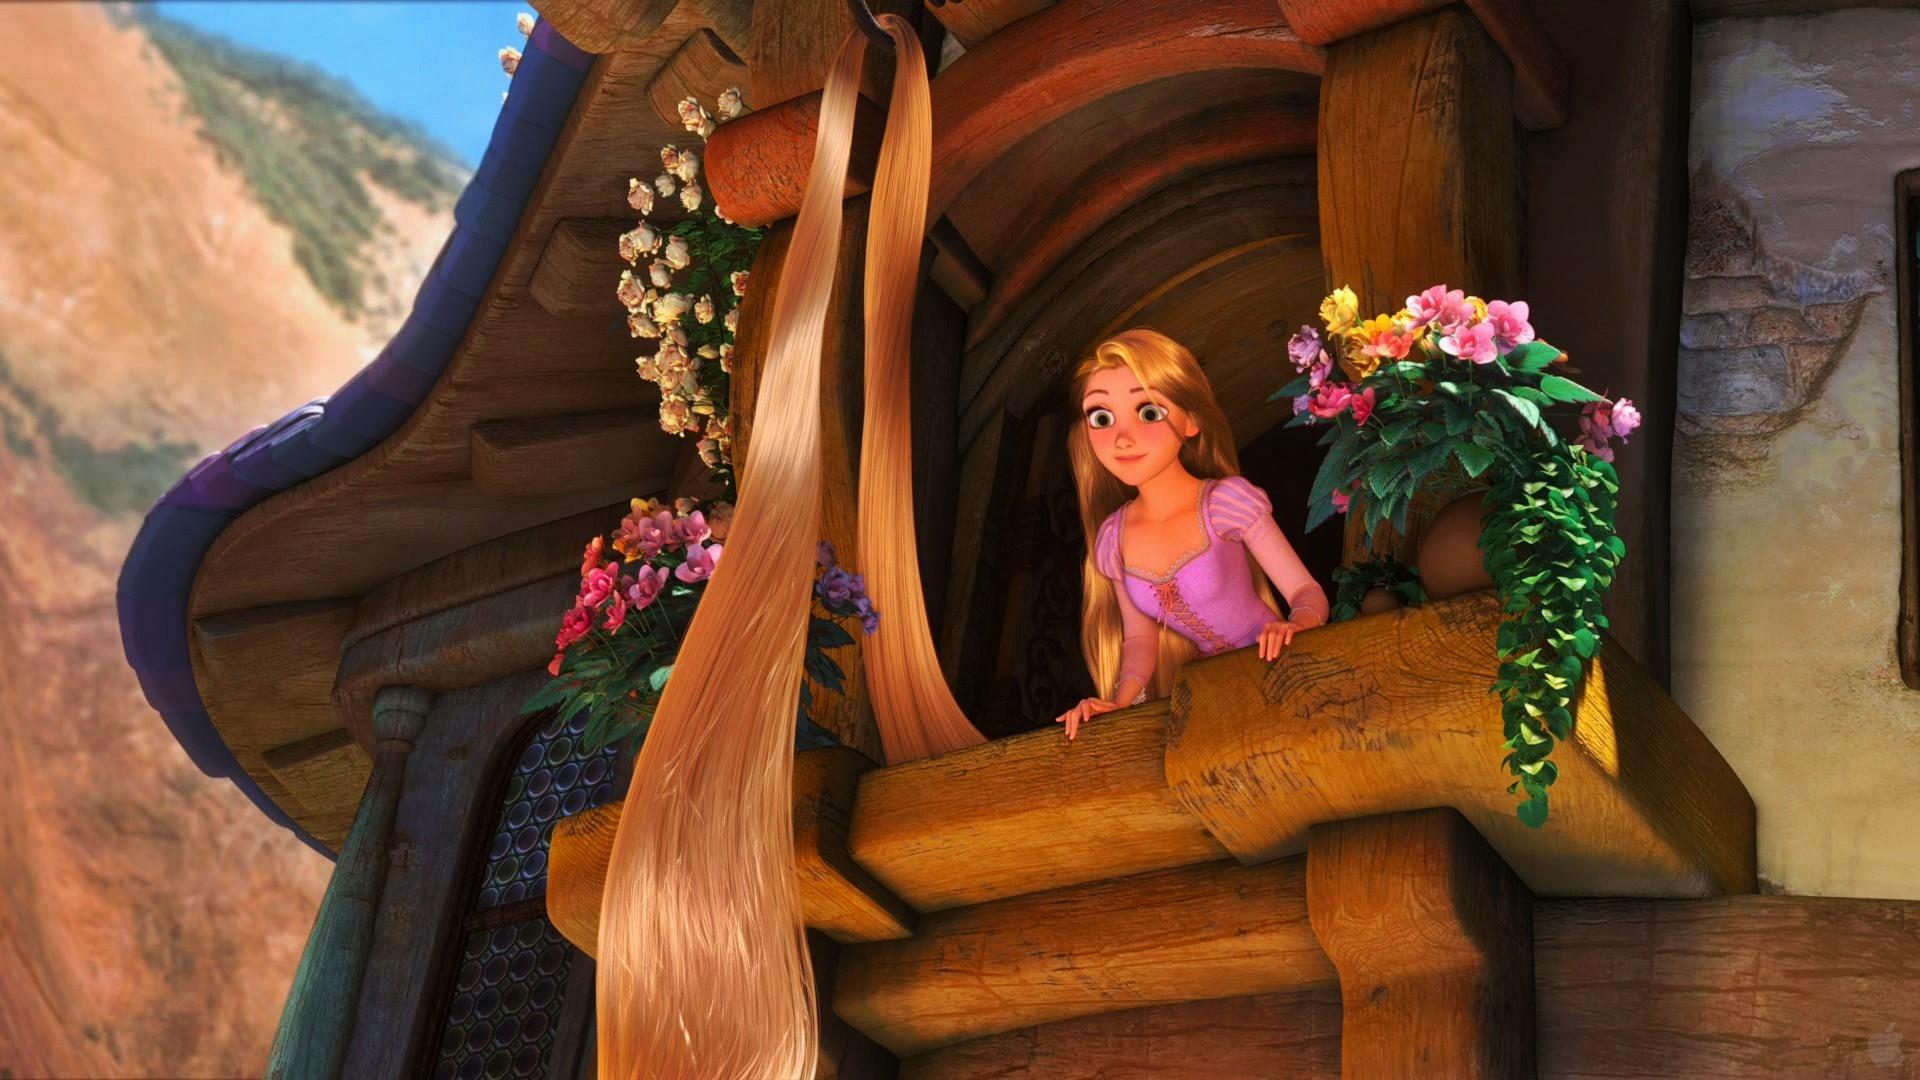 Tangled Baby Rapunzel HD desktop wallpaper : Widescreen : High 1920×1080  Tangled Rapunzel Wallpapers